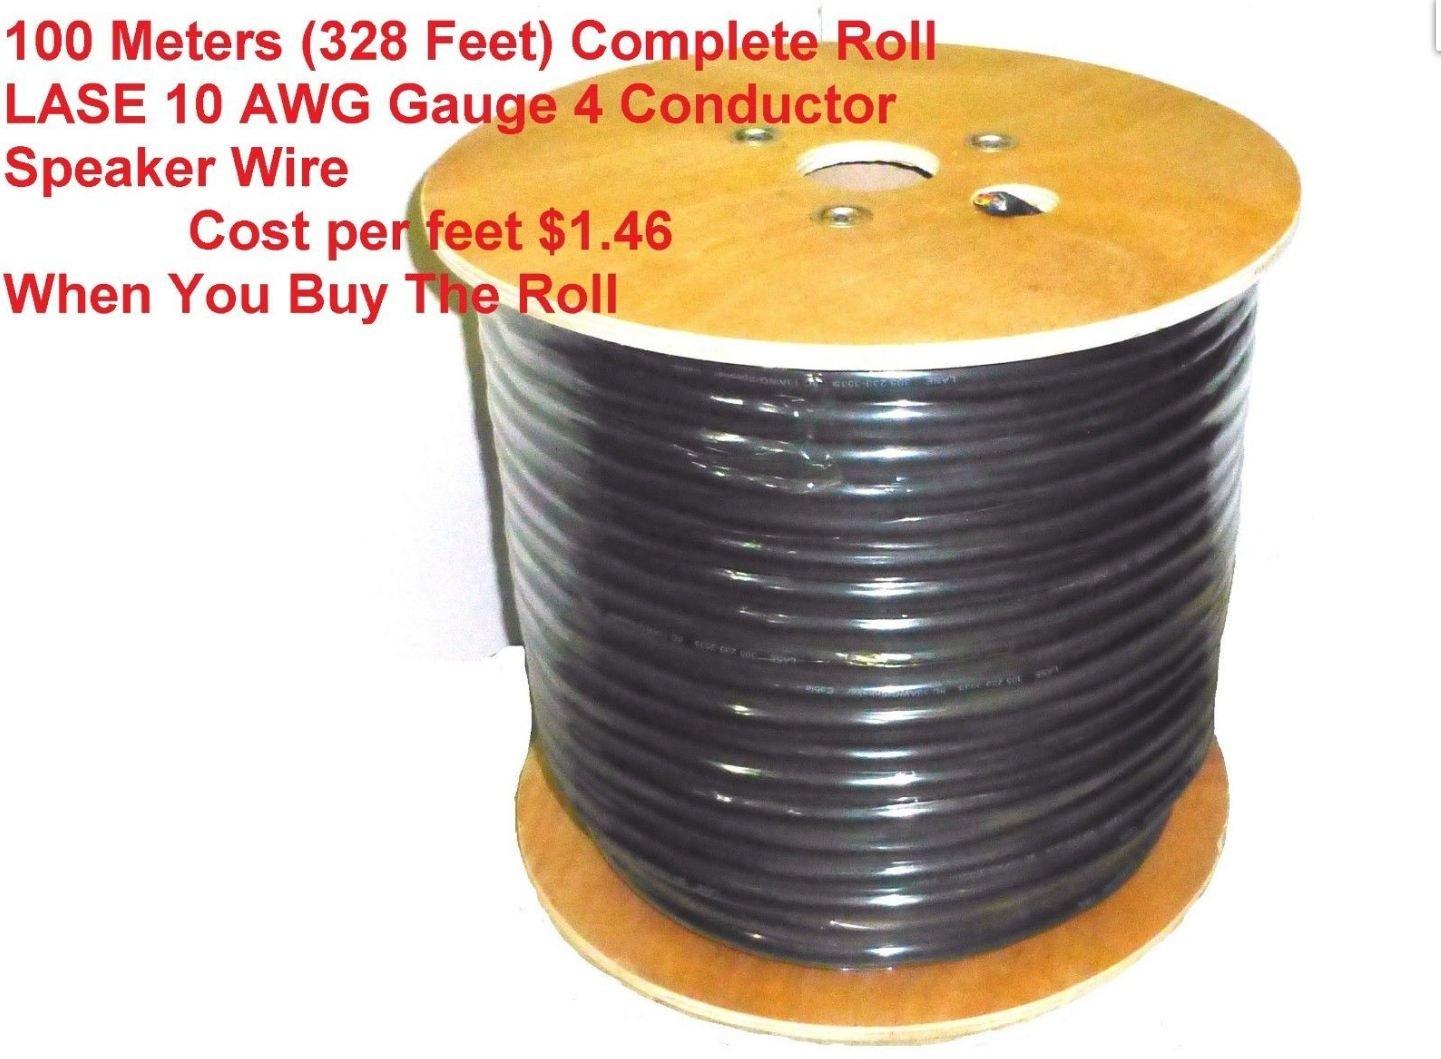 100 Meters / 328 Feet LASE 10 AWG Gauge 4 Conductor Heavy Duty Speaker Wire